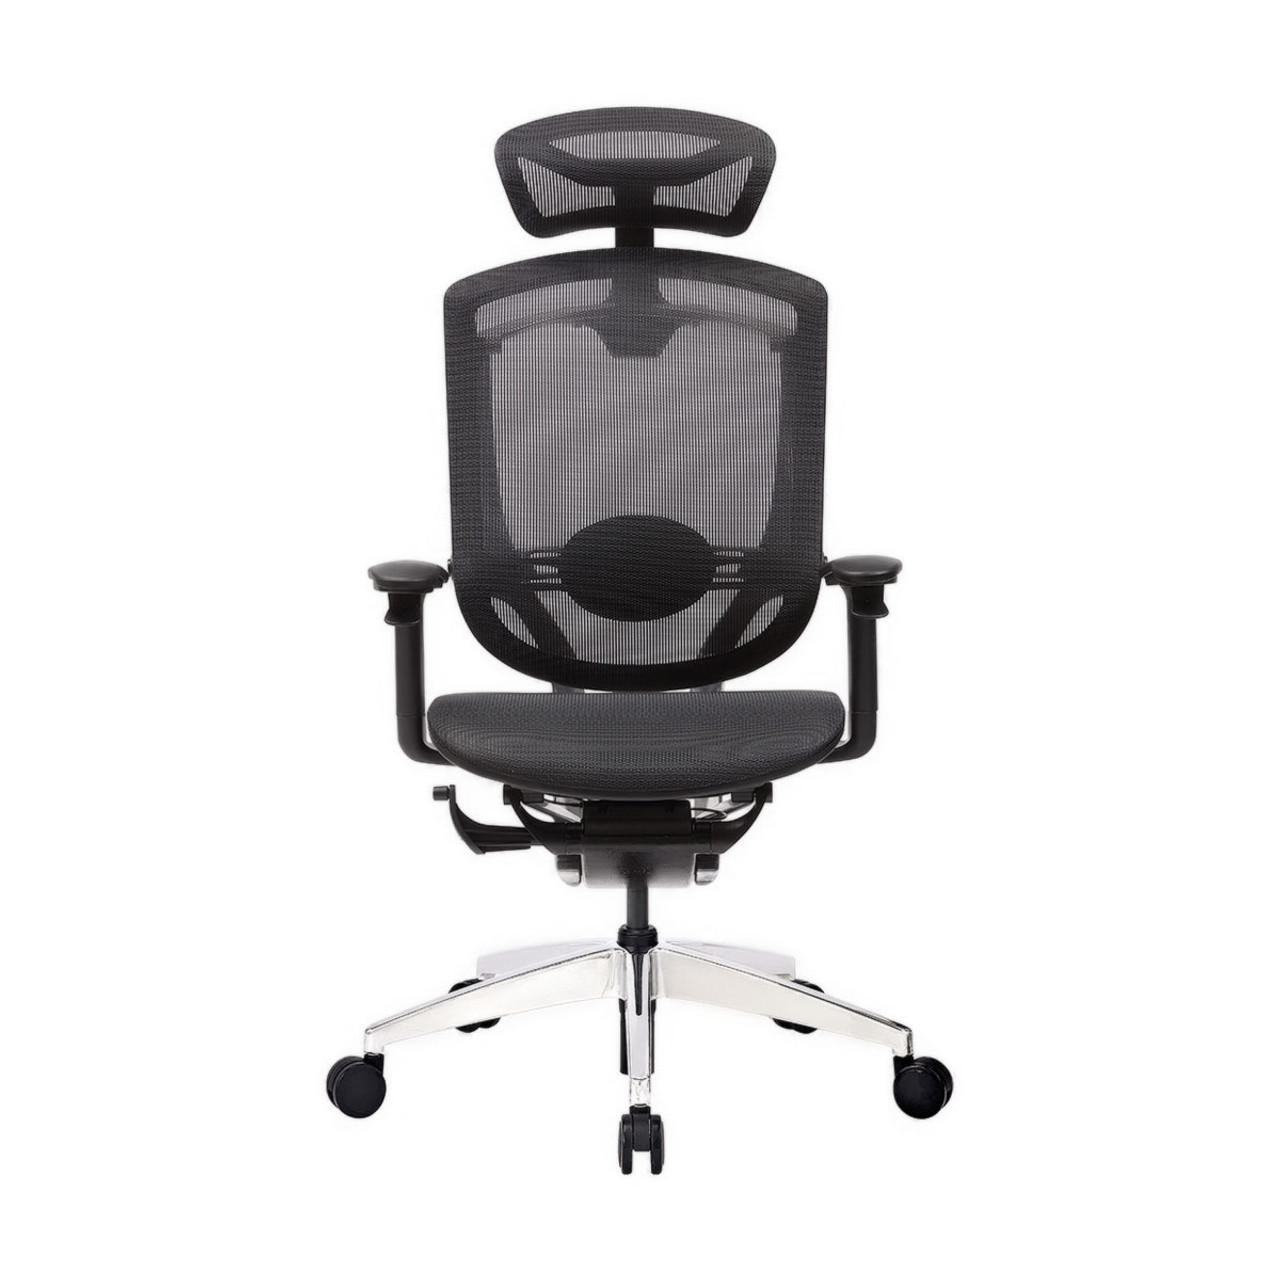 EFurnit Ergonomic Office Chair, Dee Series